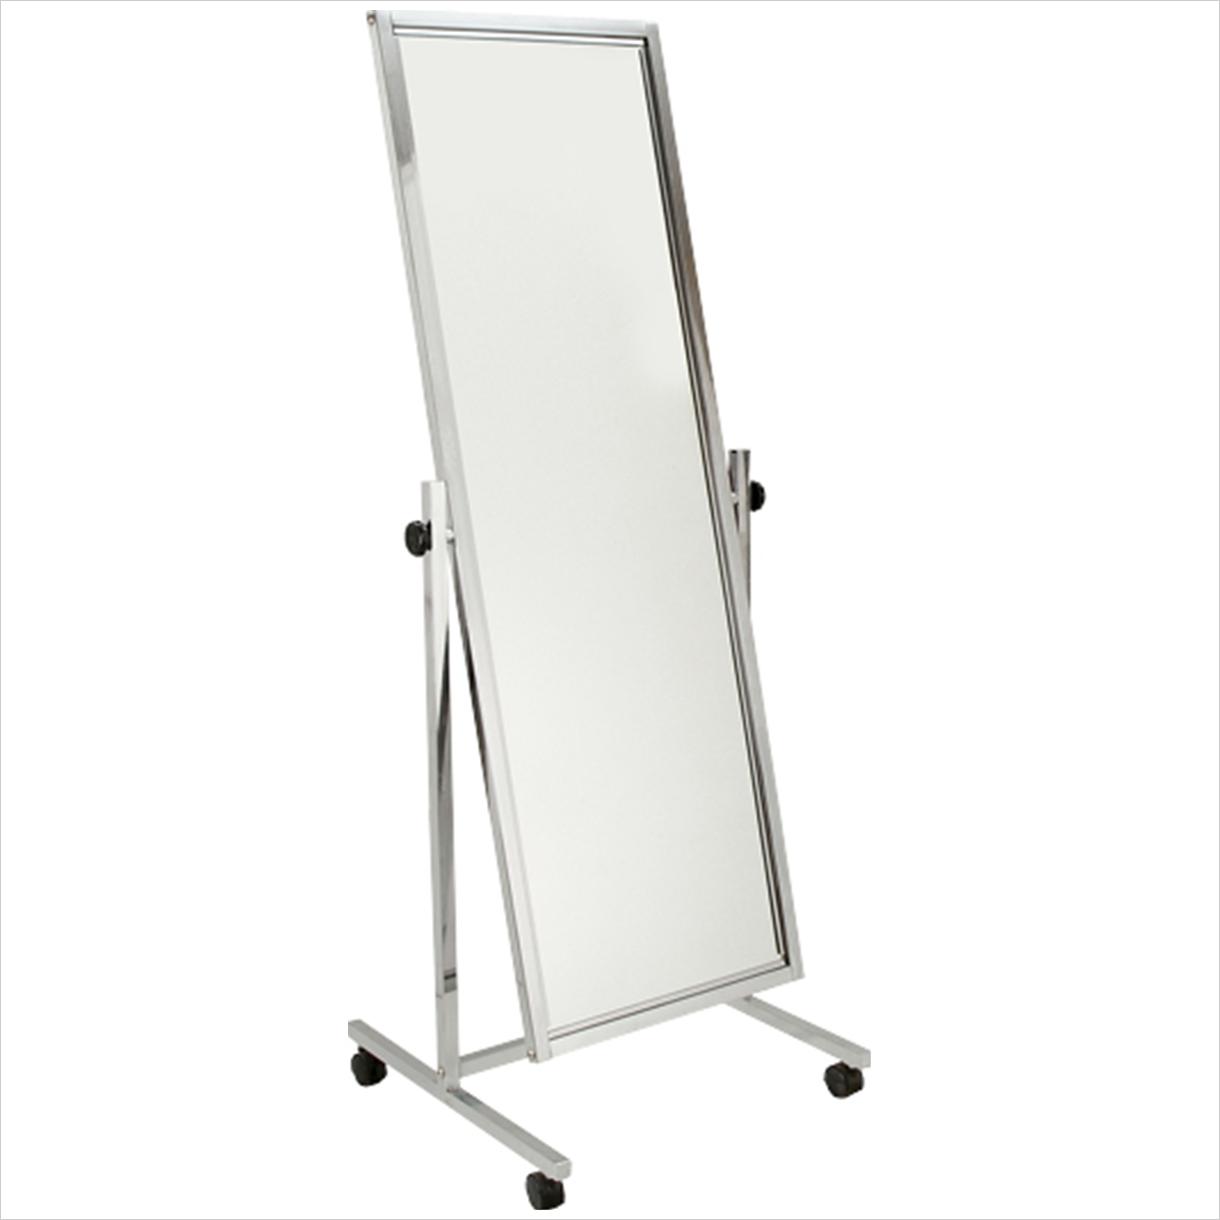 countertop countertops platforms frame mirrors mirror adjustable tilting storage displays clear